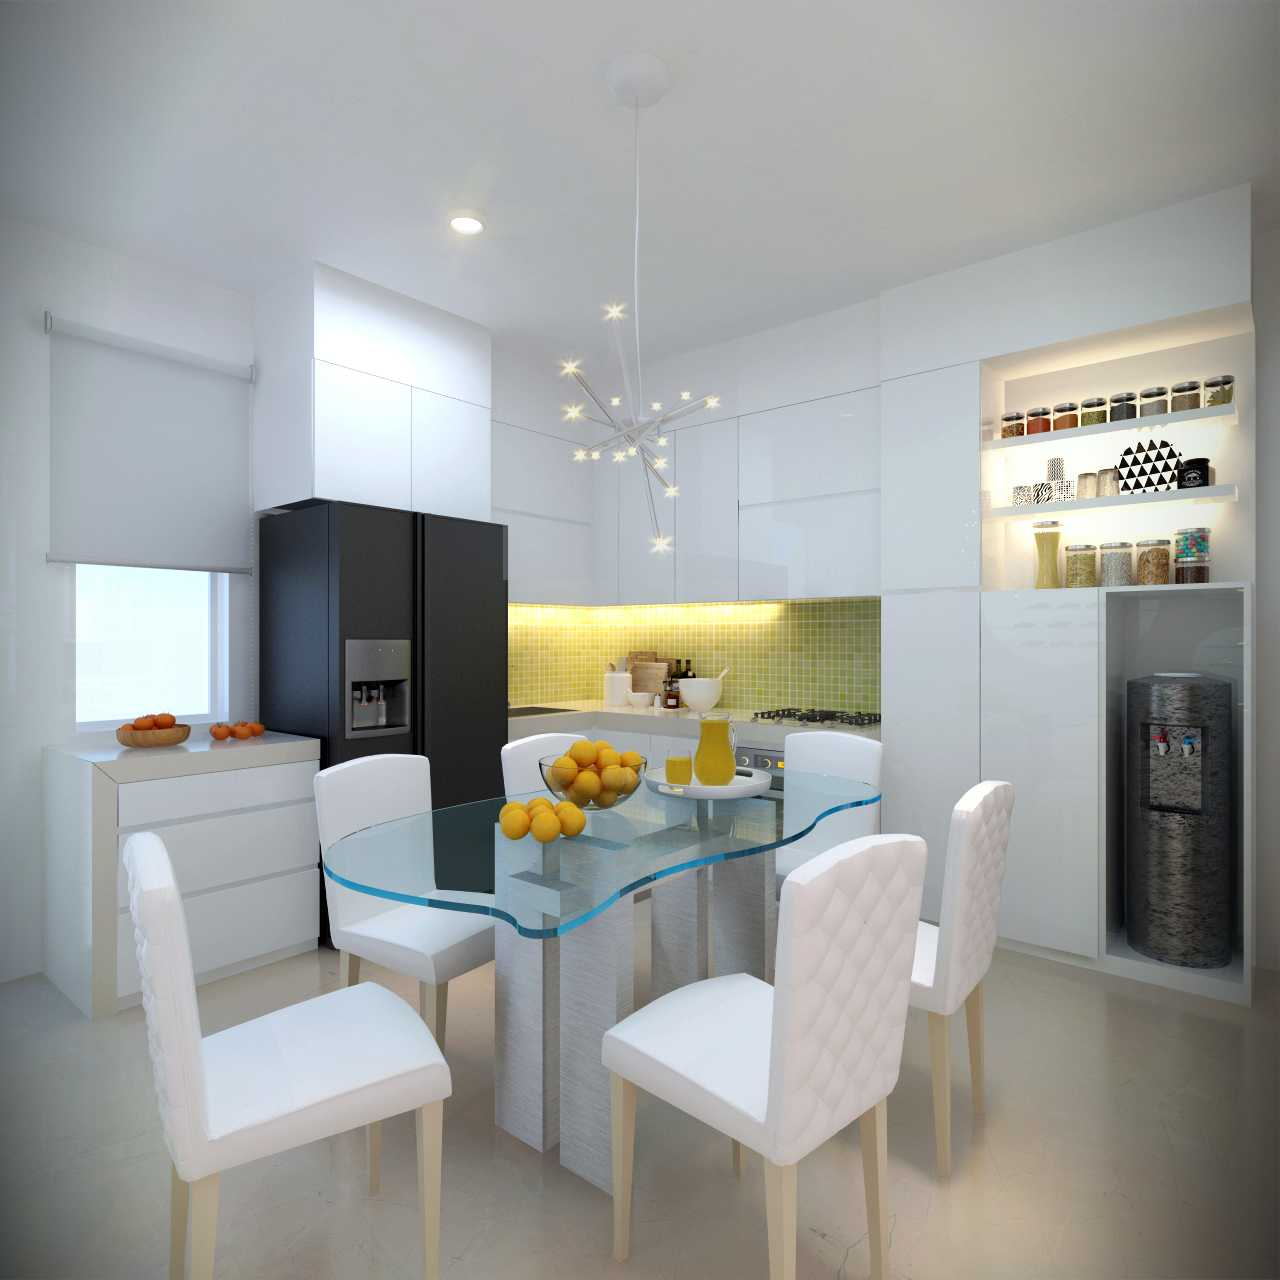 Meili Darmasetiawan Summerbliss Residence Lippo Cikarang Bekasi Lippo Cikarang Bekasi Kitchen Modern 13793